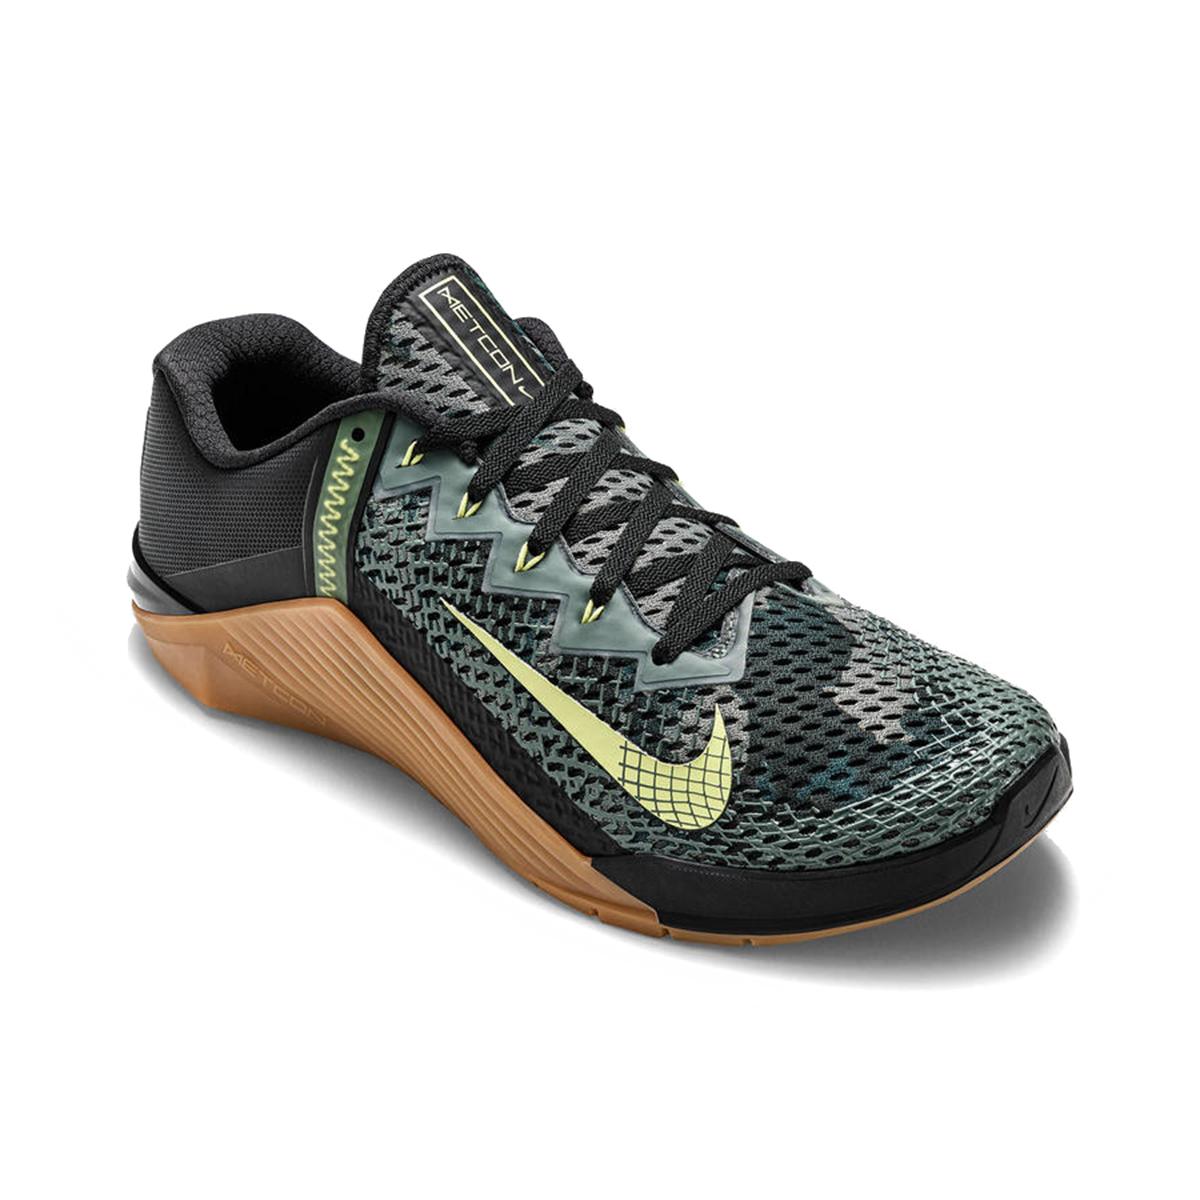 Men's Nike Metcon 6 Training Shoes - Color: Valerian Blue - Size: 3.5 - Width: Regular, Valerian Blue, large, image 1